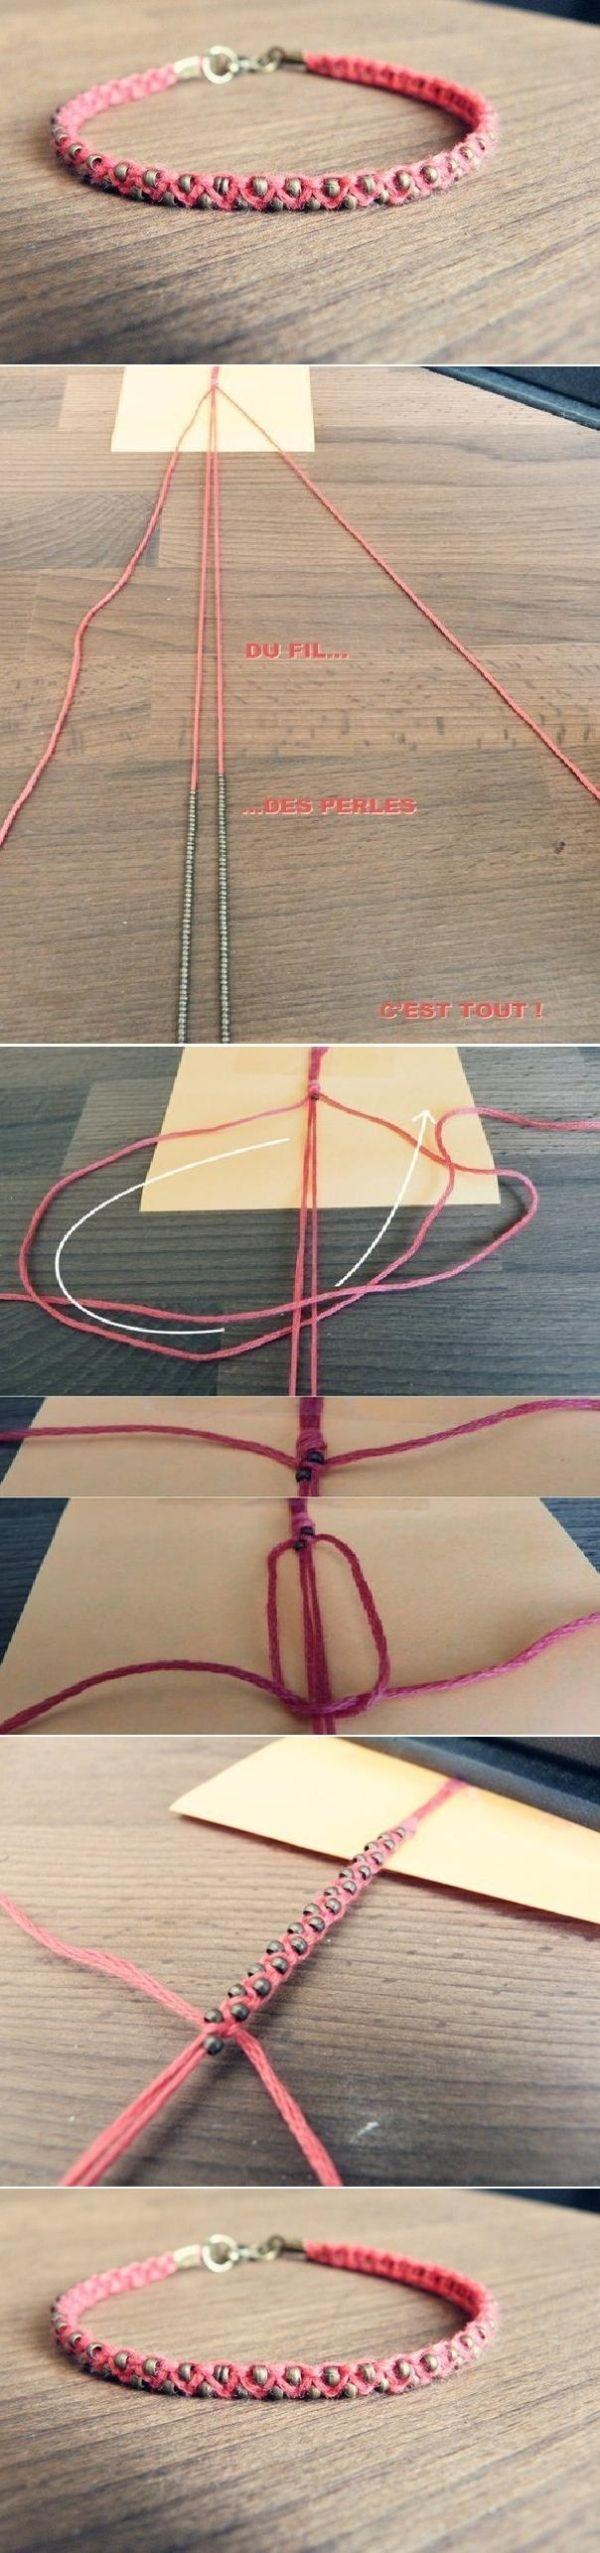 DIY Just a Weave Bracelet - Tutorial ❥ 4U // hf by iluvmario